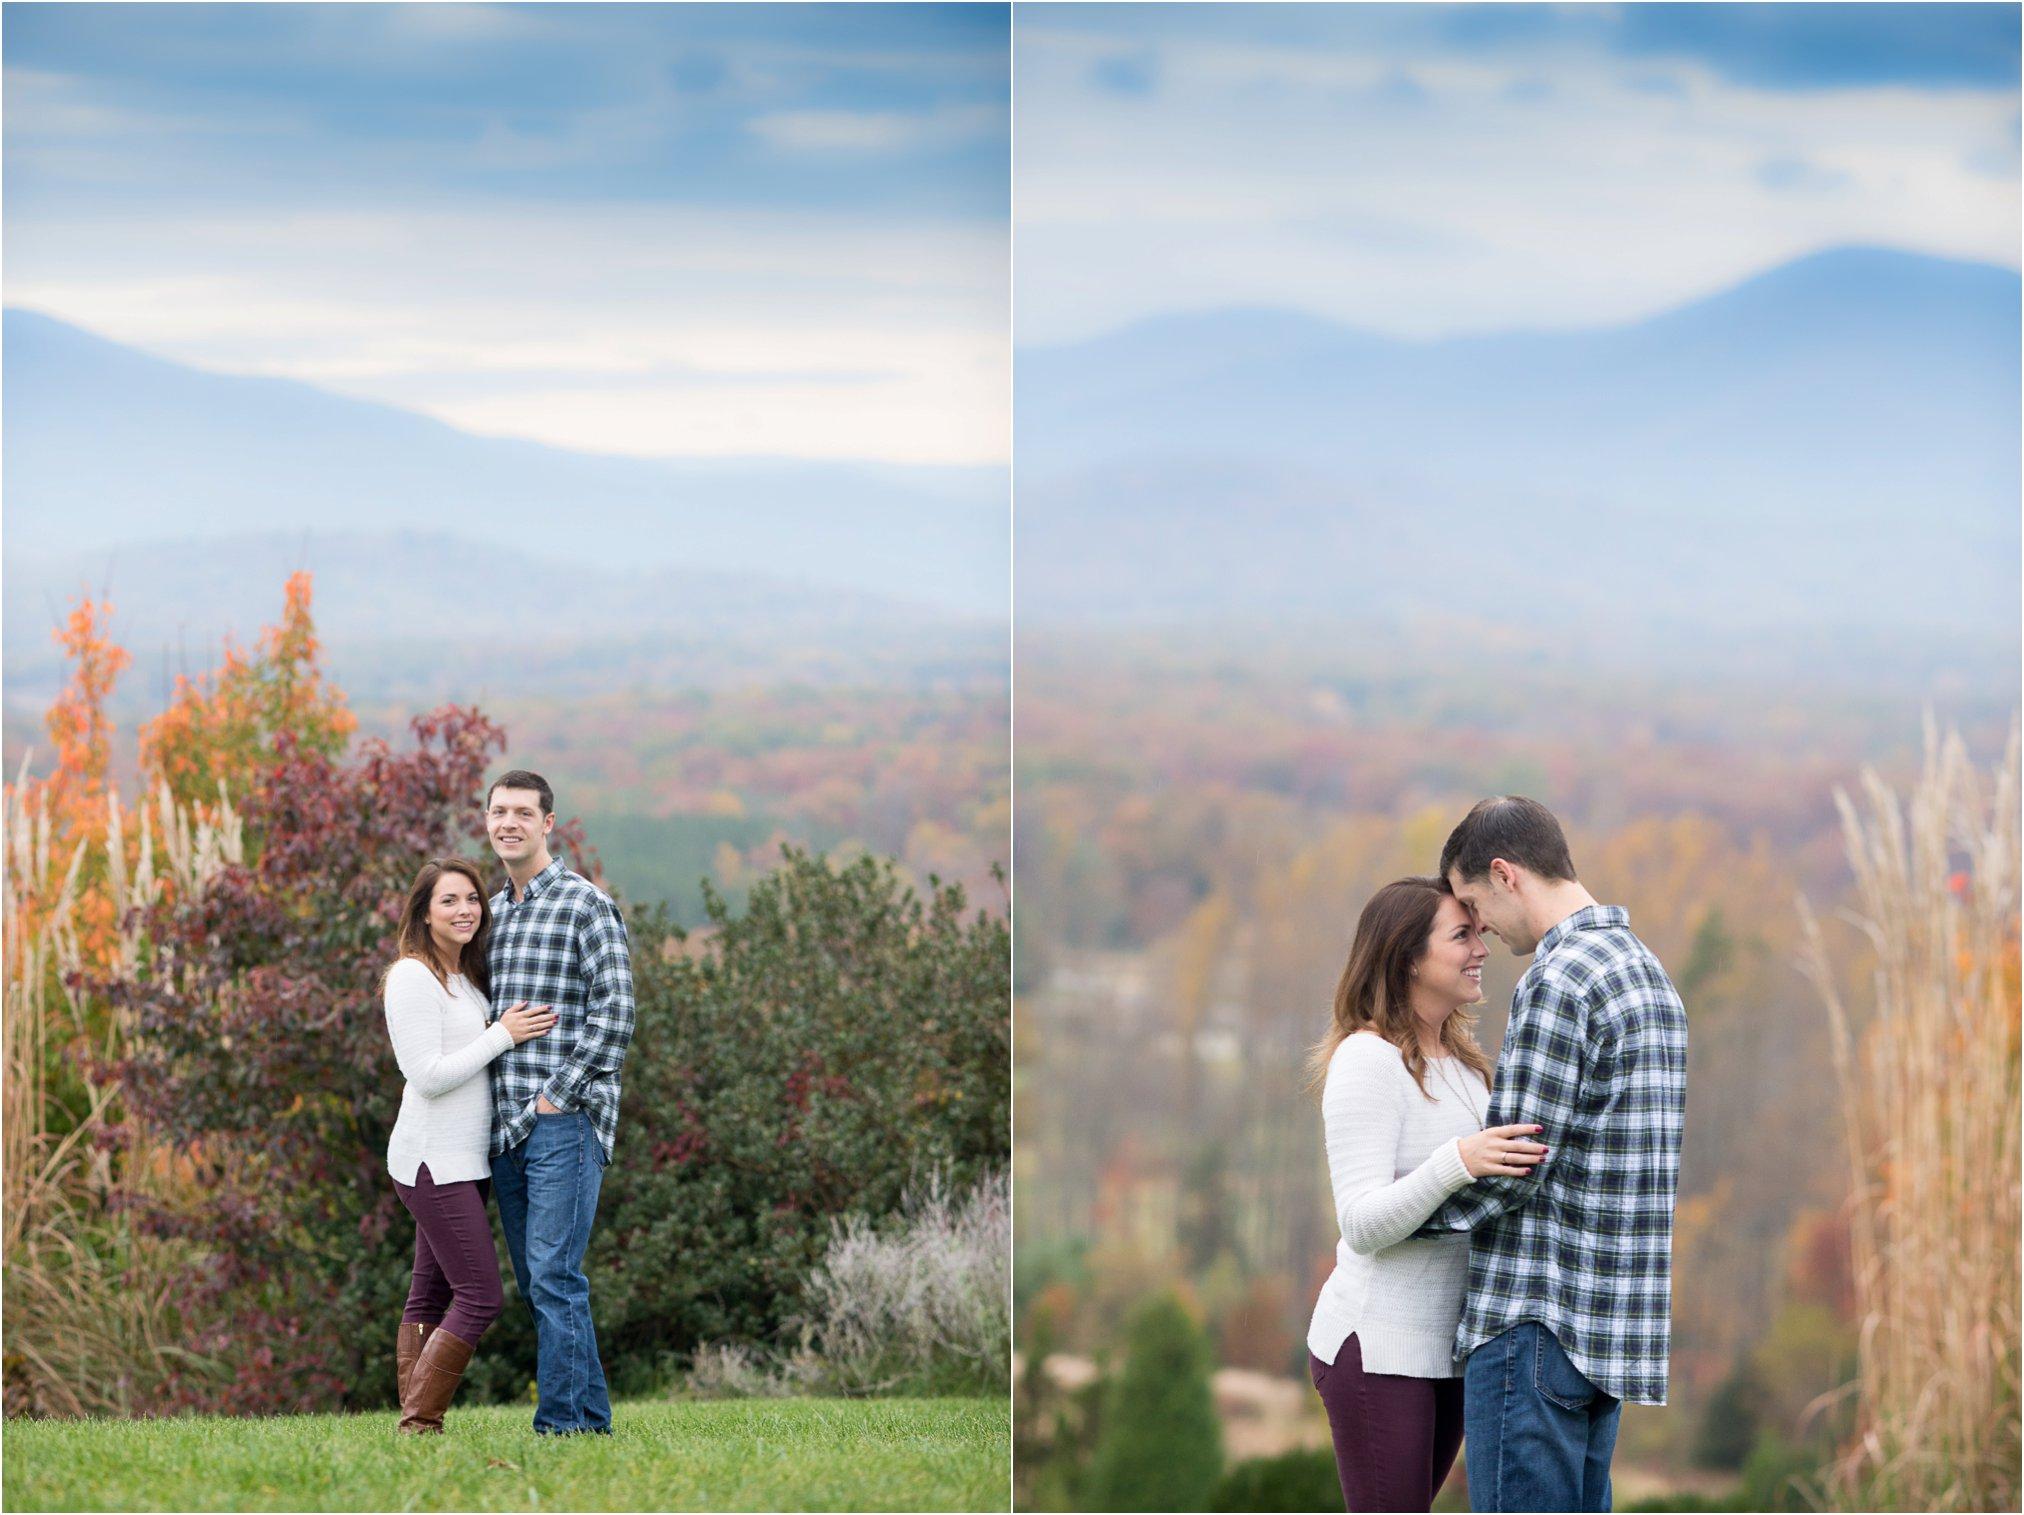 Nelson County Engagement-1-2.jpg